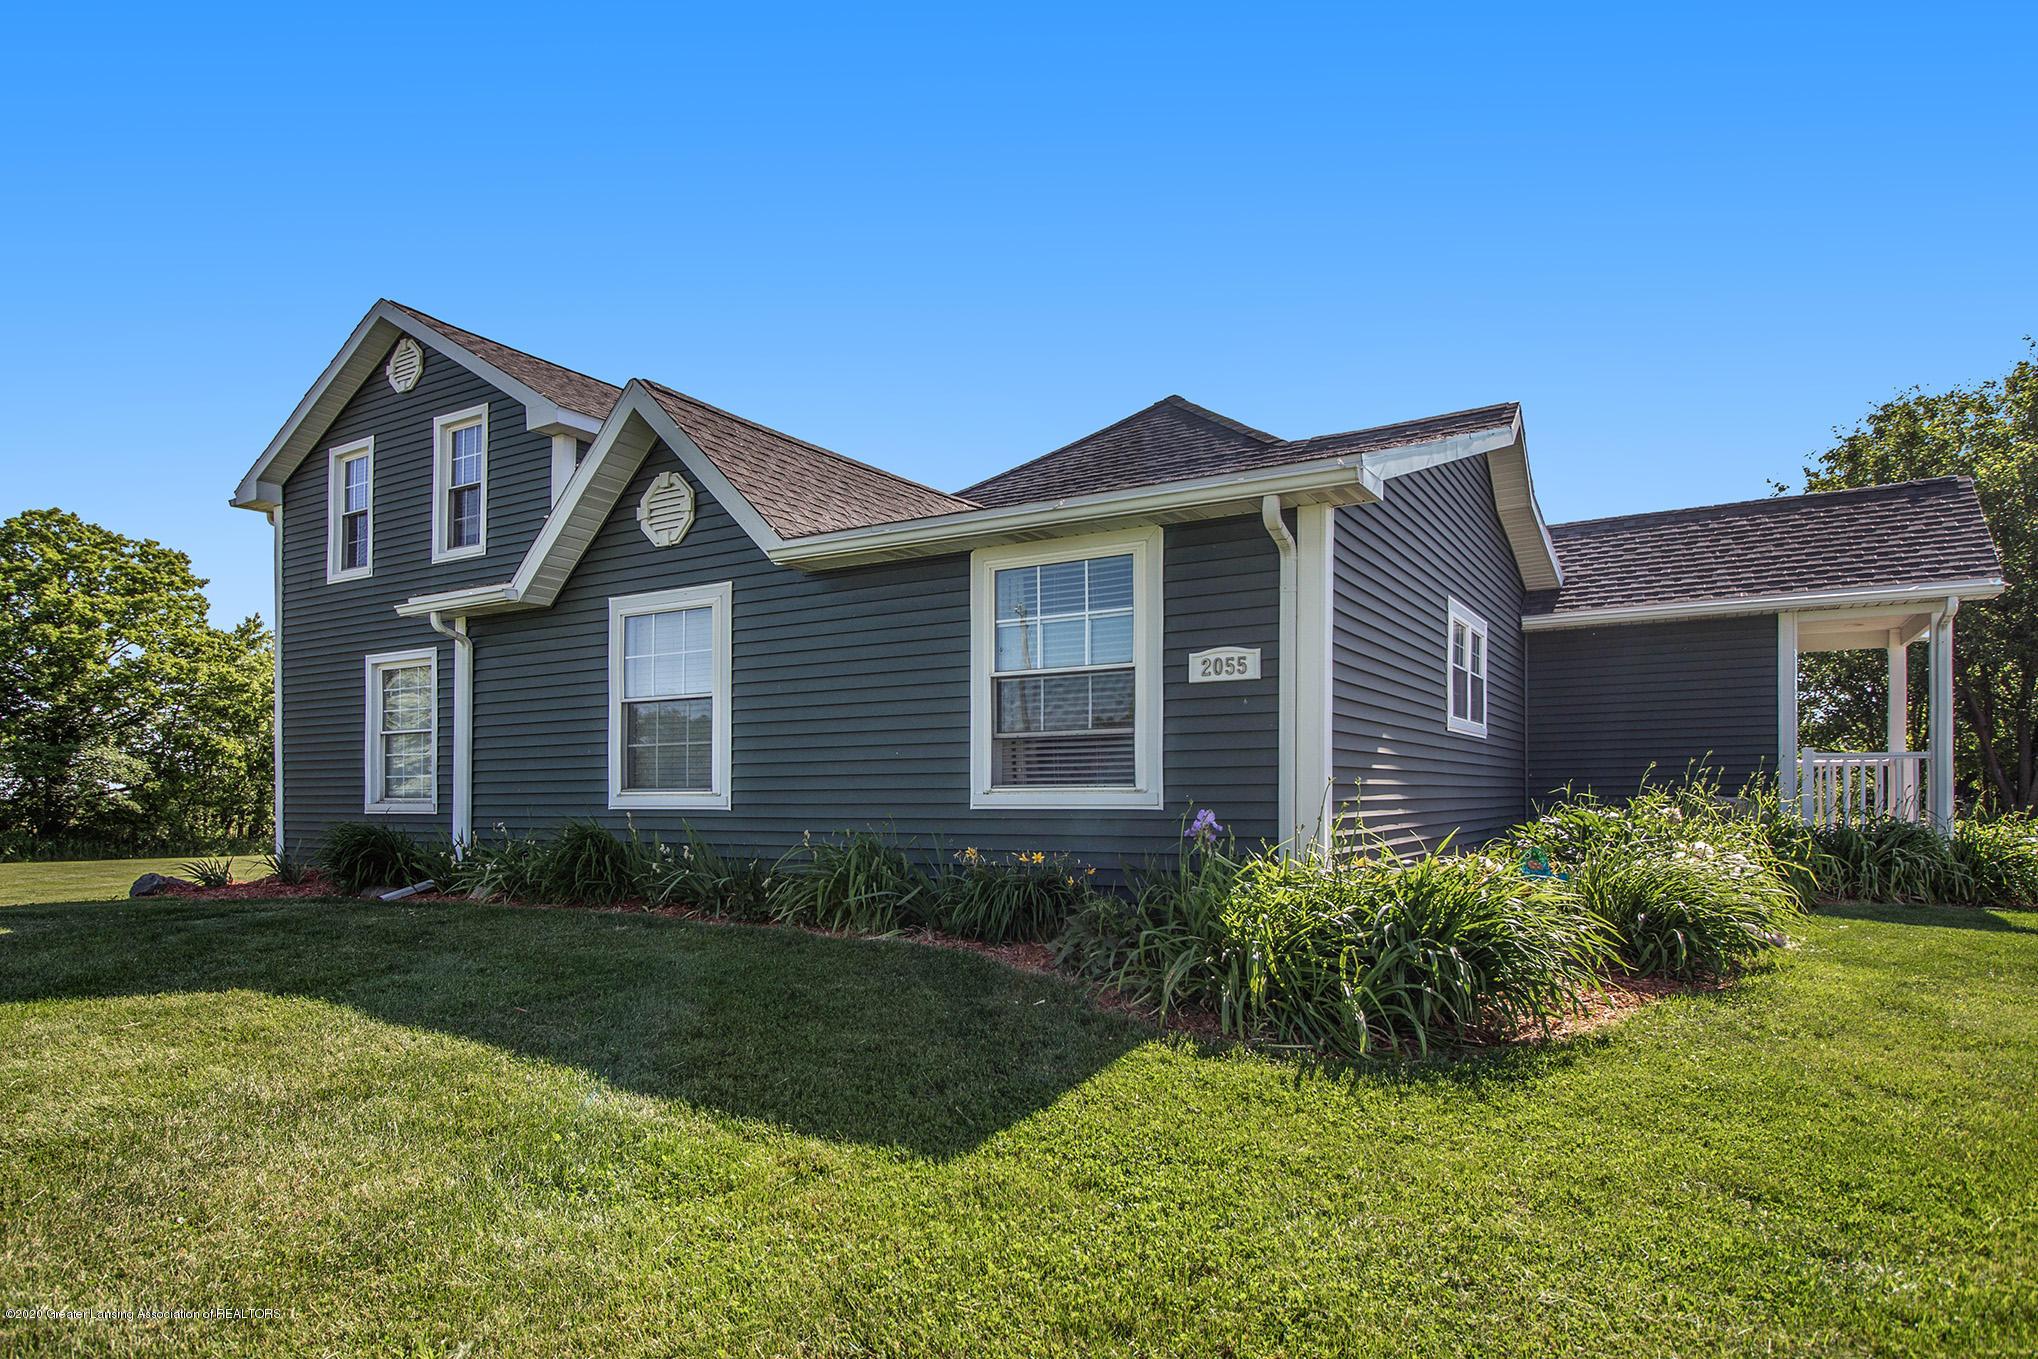 2055 Tuttle Rd - House 3 - 29